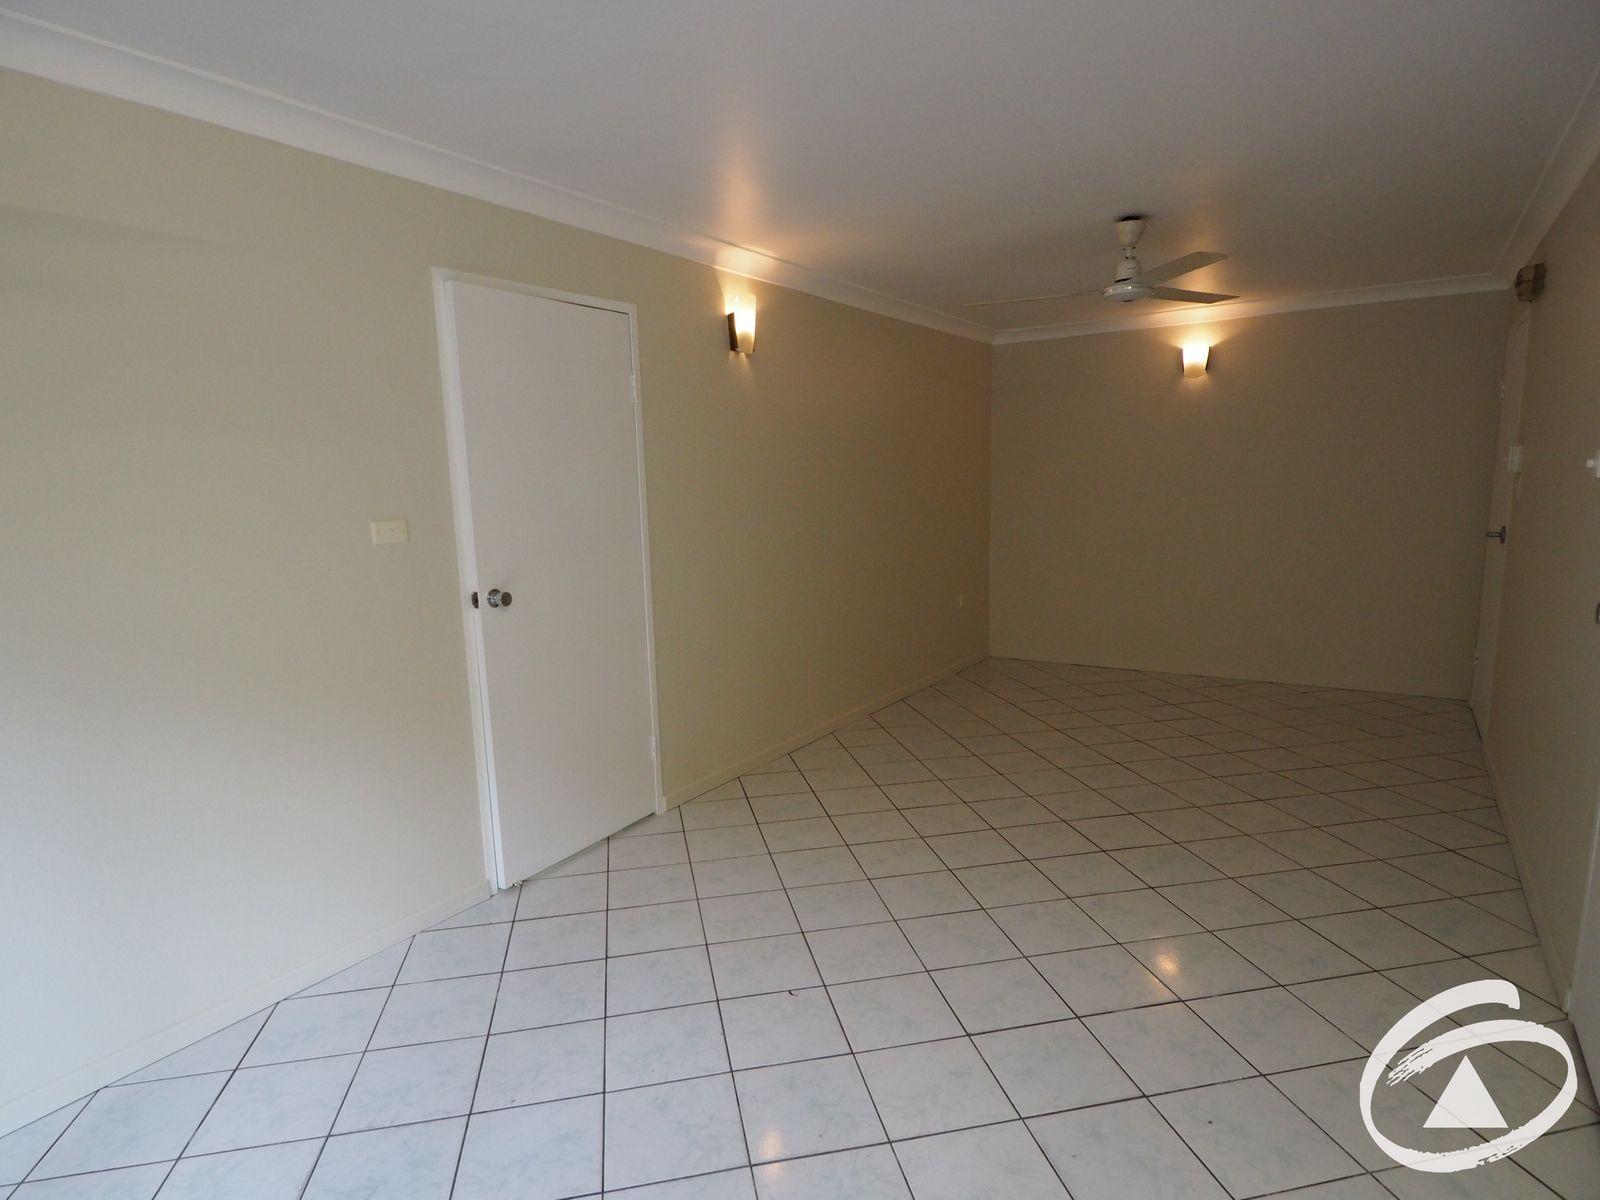 13/350 Sheridan Street, Cairns North, QLD 4870